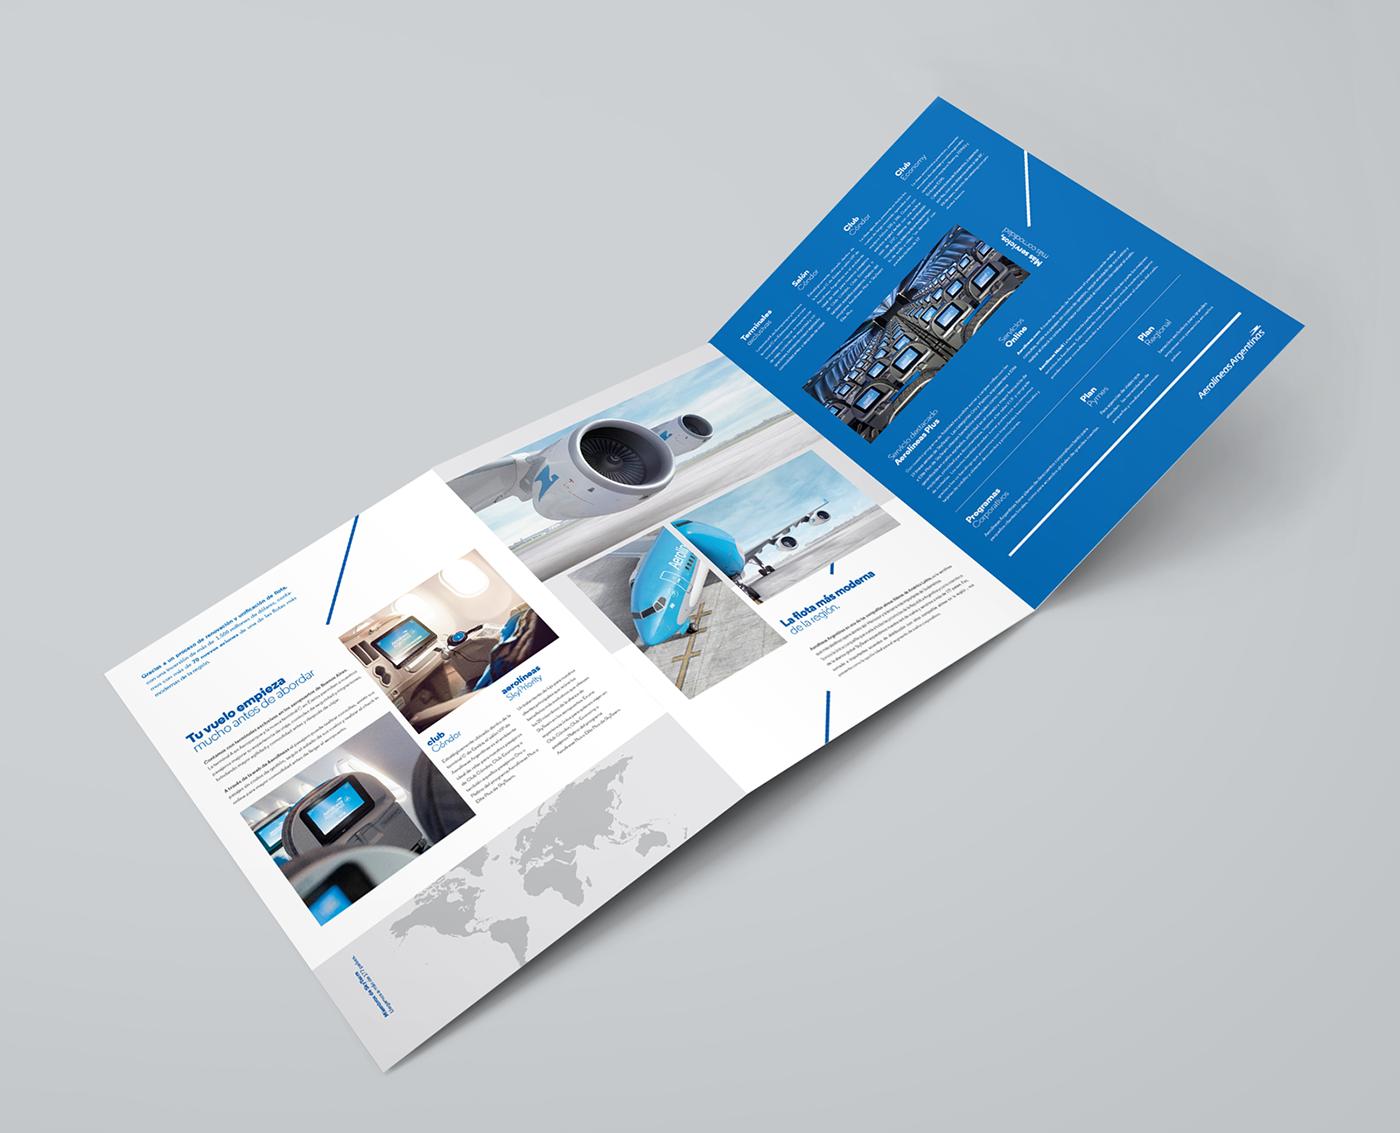 aerolineas SKY plane Aeroplane airline brochure editorial design graphic type